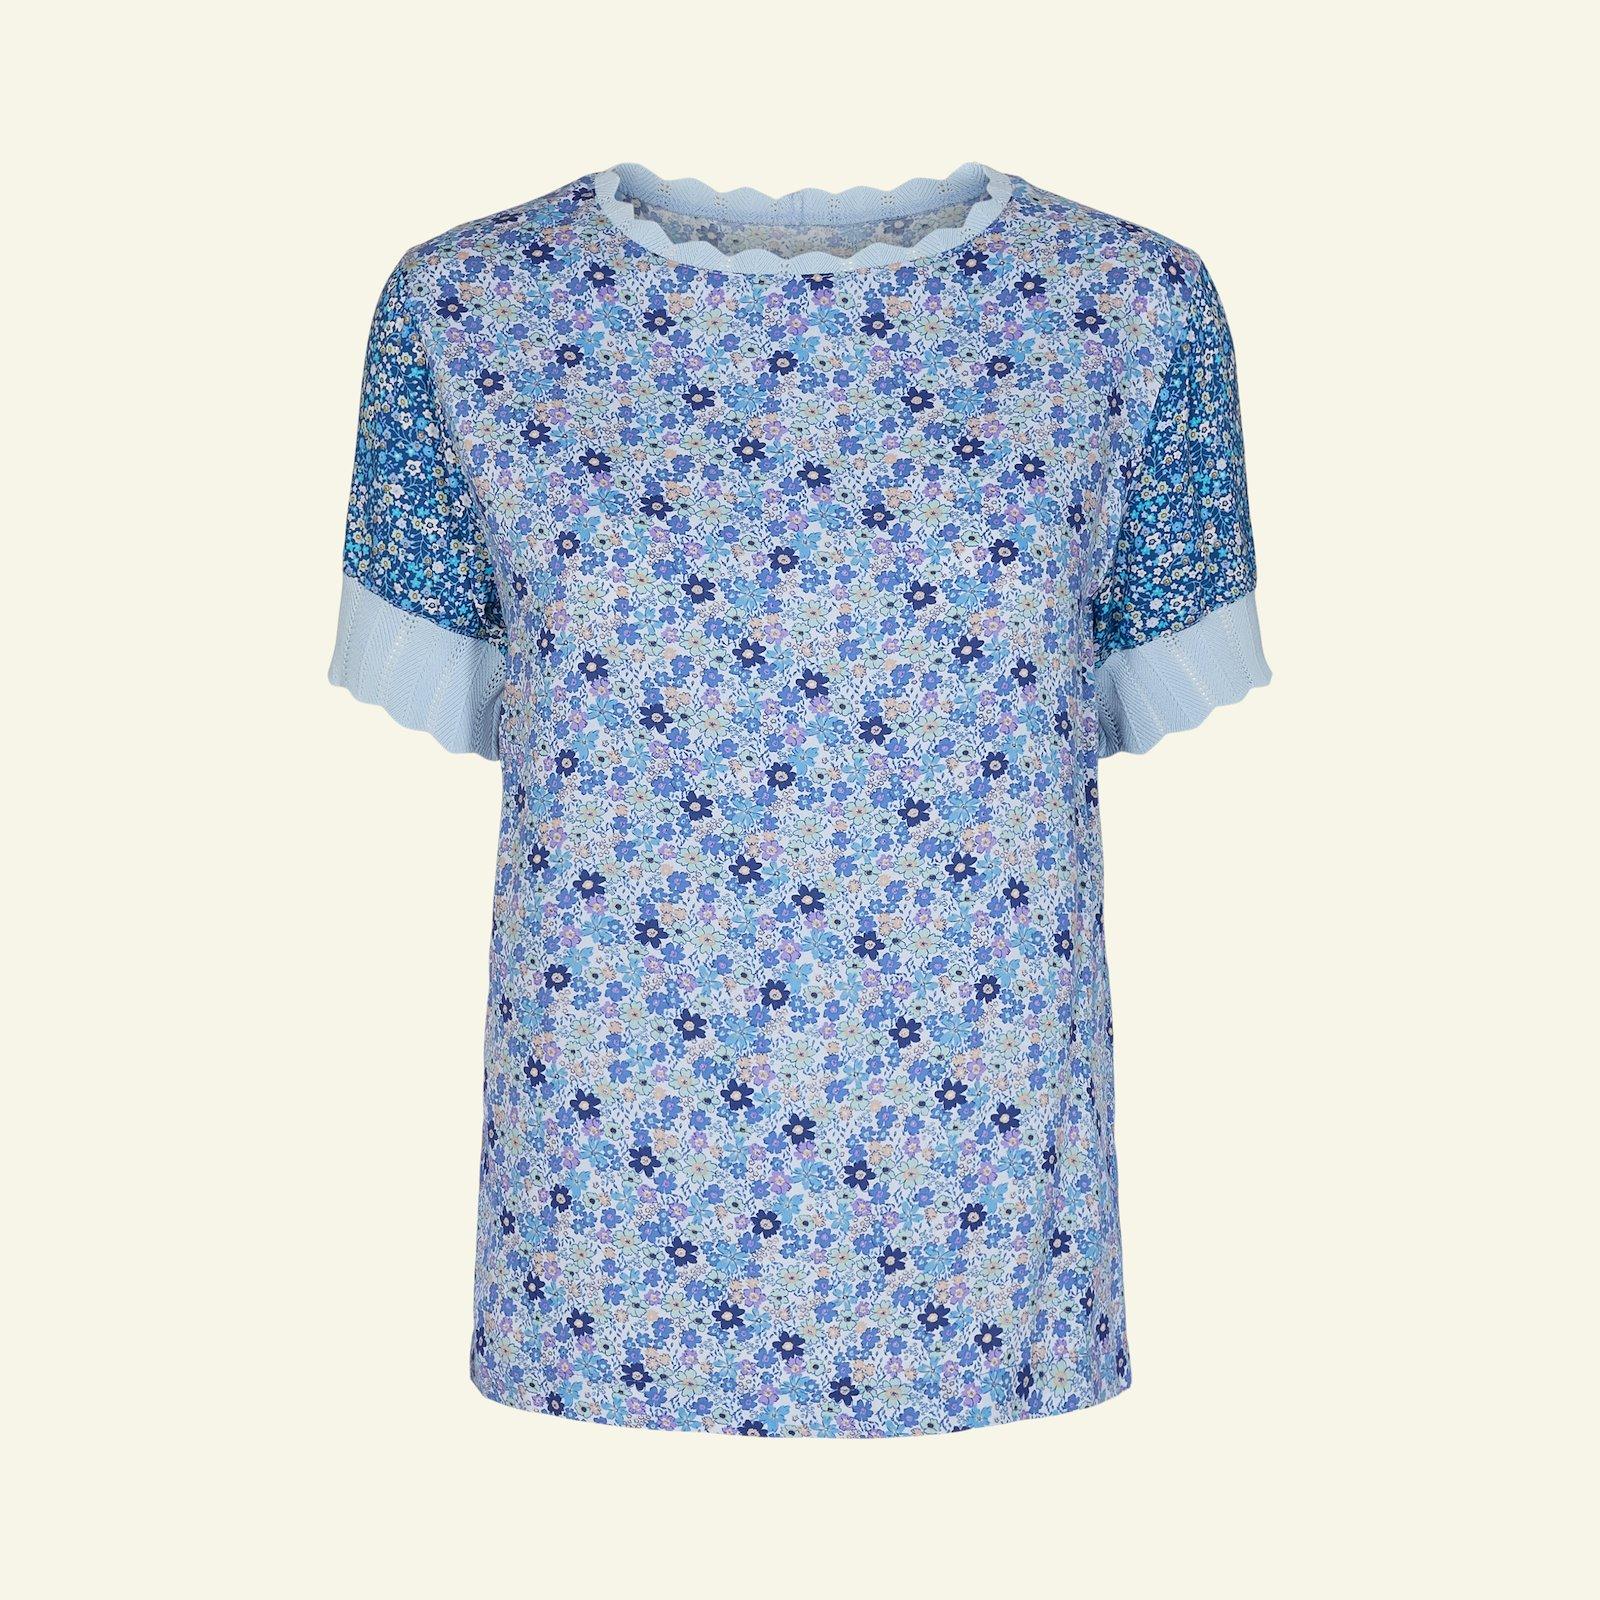 Rib knitted 6x55cm light blue 1pc p22061_710638_710639_96136_sskit